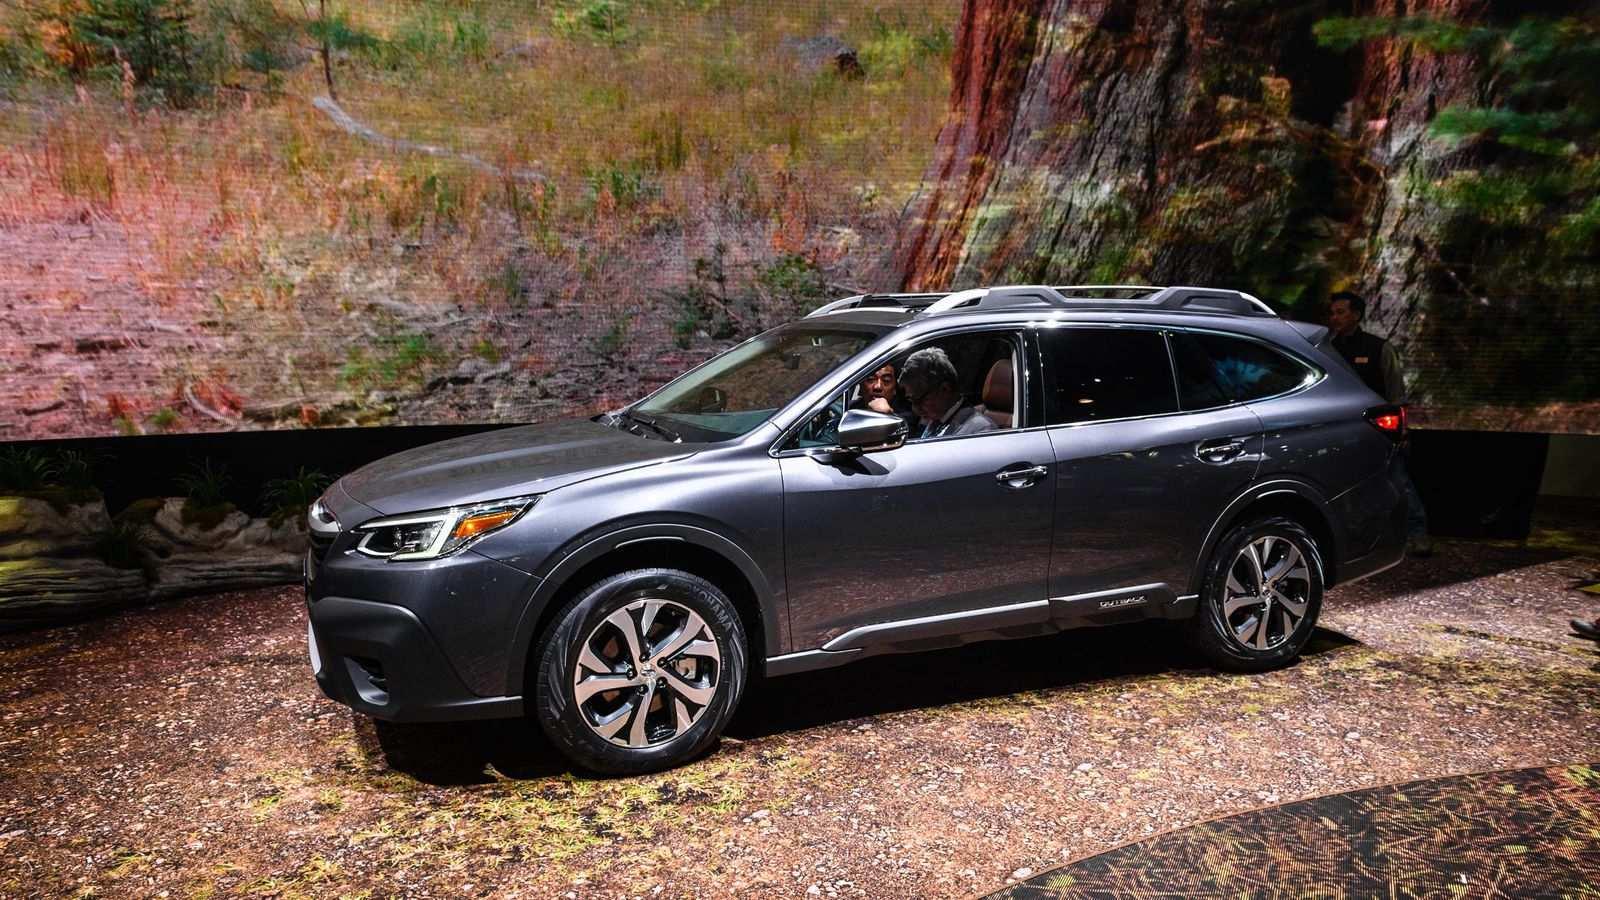 89 New Subaru Outback 2020 Picture for Subaru Outback 2020